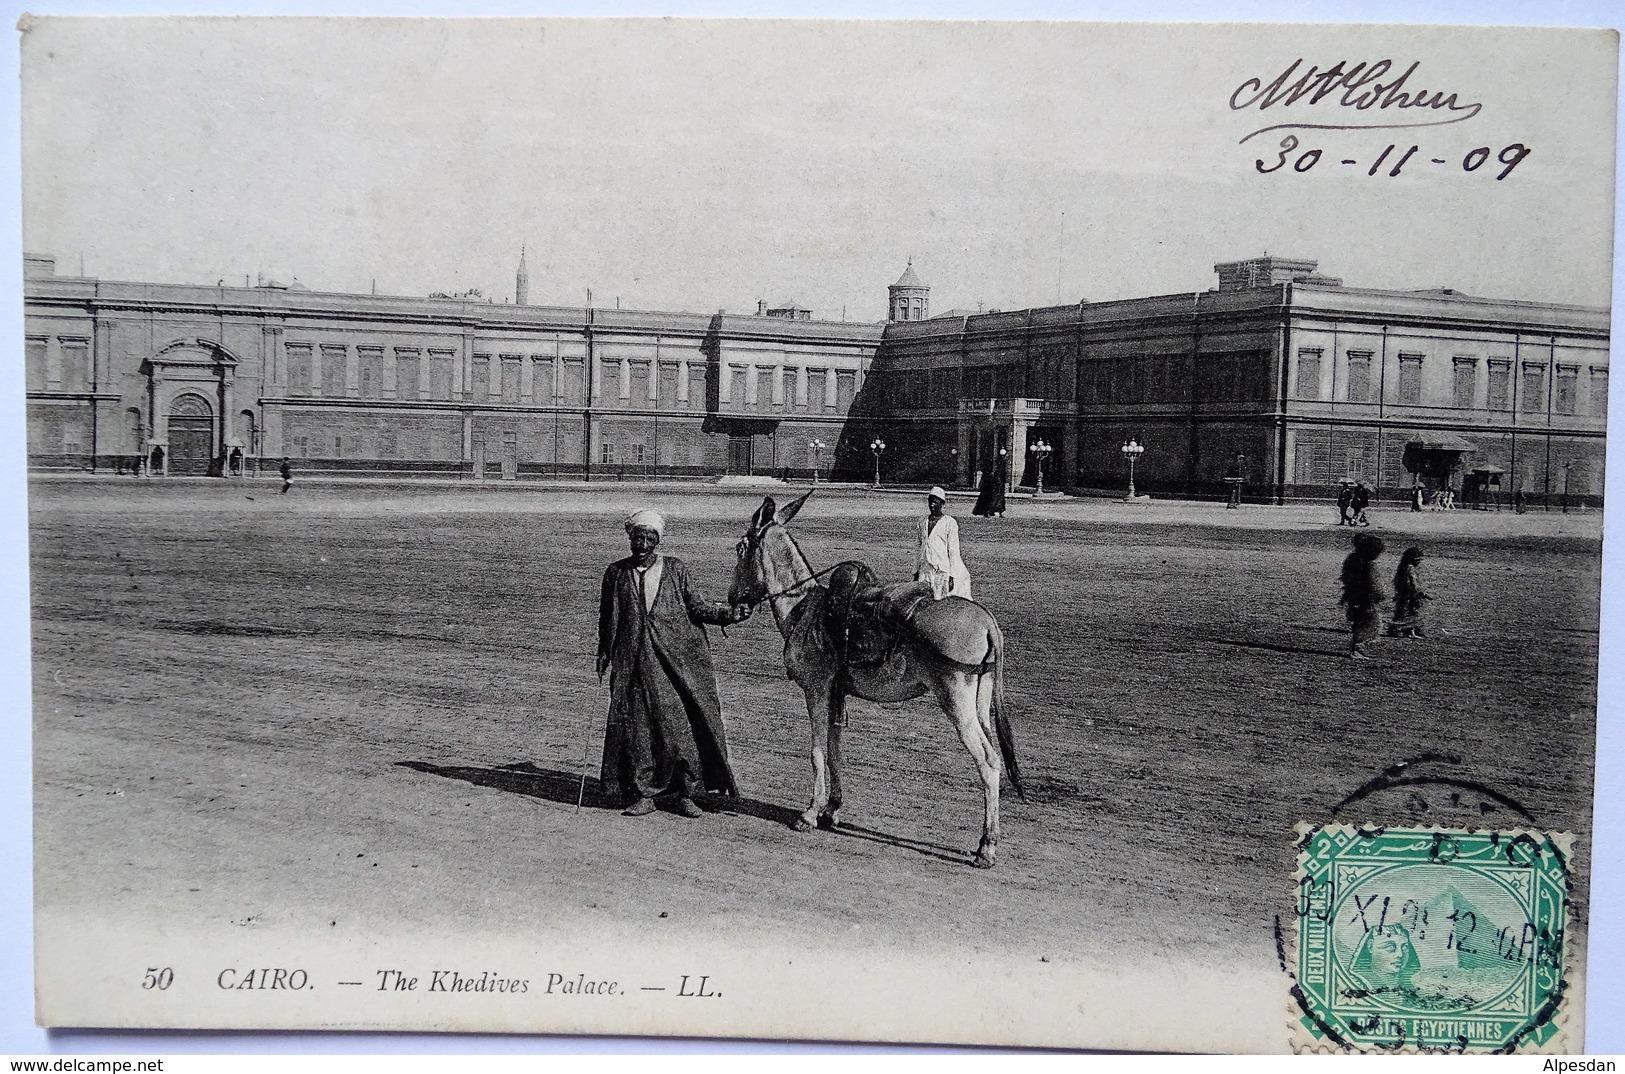 LE CAIRE. The Khedives Palace - Cairo